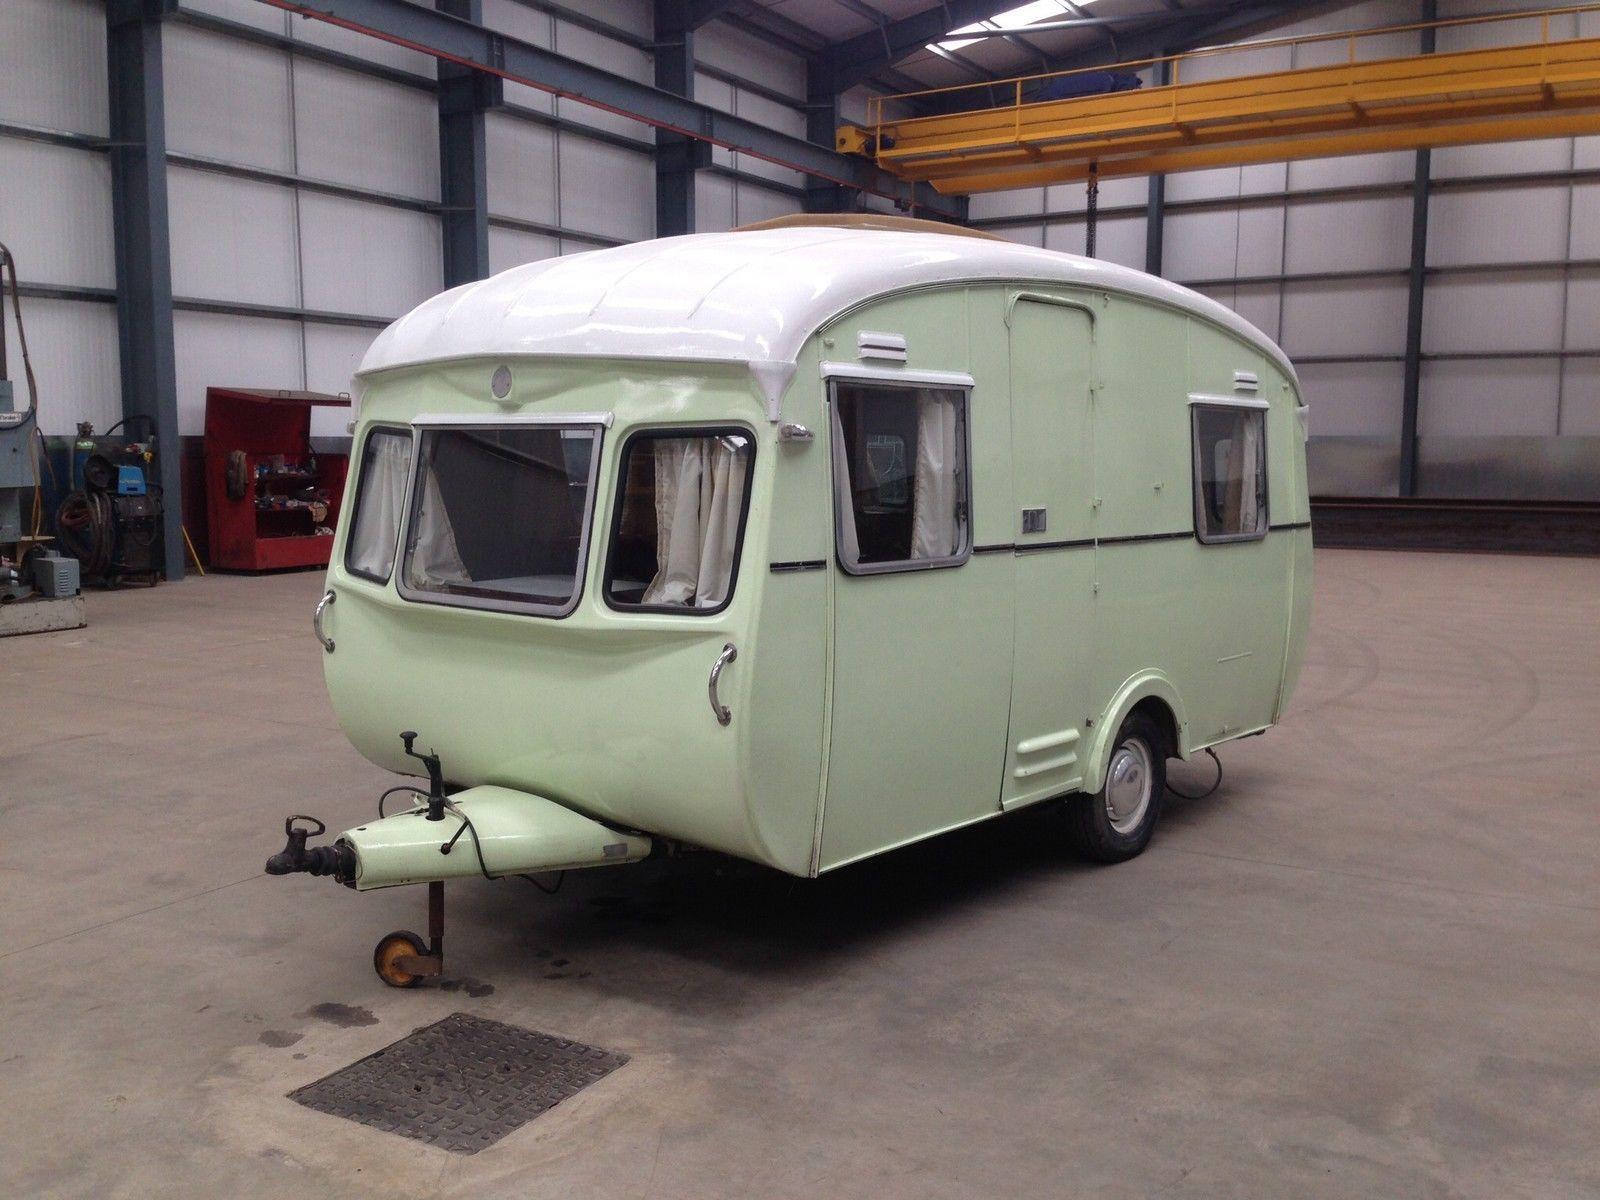 Vintage Cheltenham Sable Caravan With Awning Yours For 1000 Now On Ebay Vintage Vans Vintage Travel Trailers Caravan